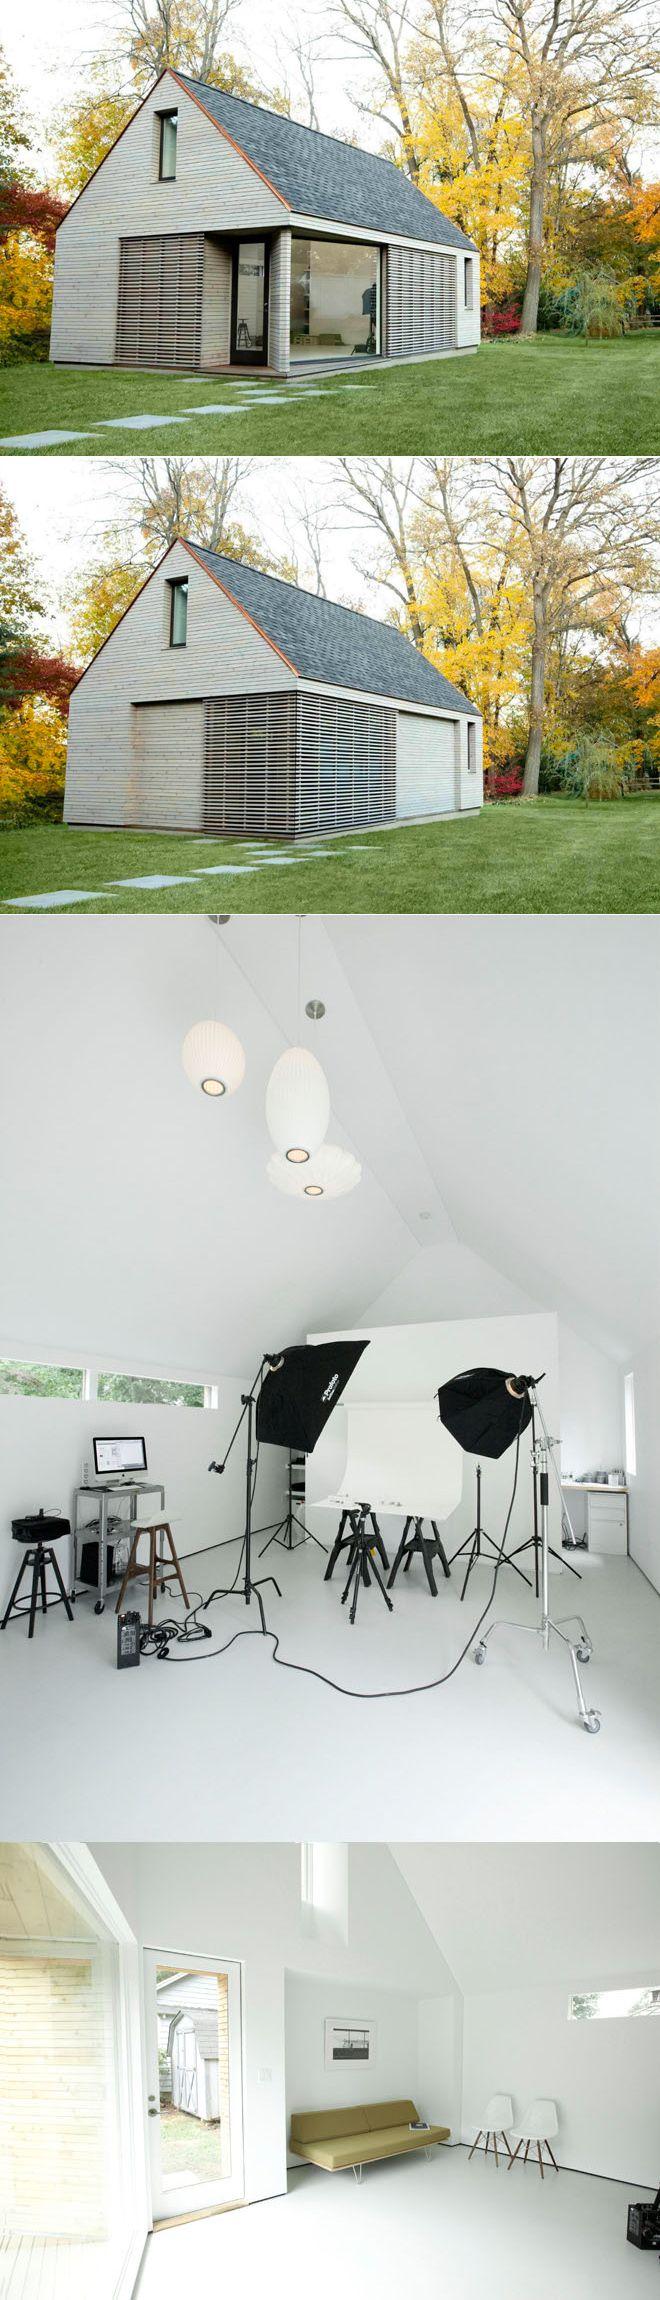 Photography studio for Alix Martinez. Note sliding shutters, completely even white interior.